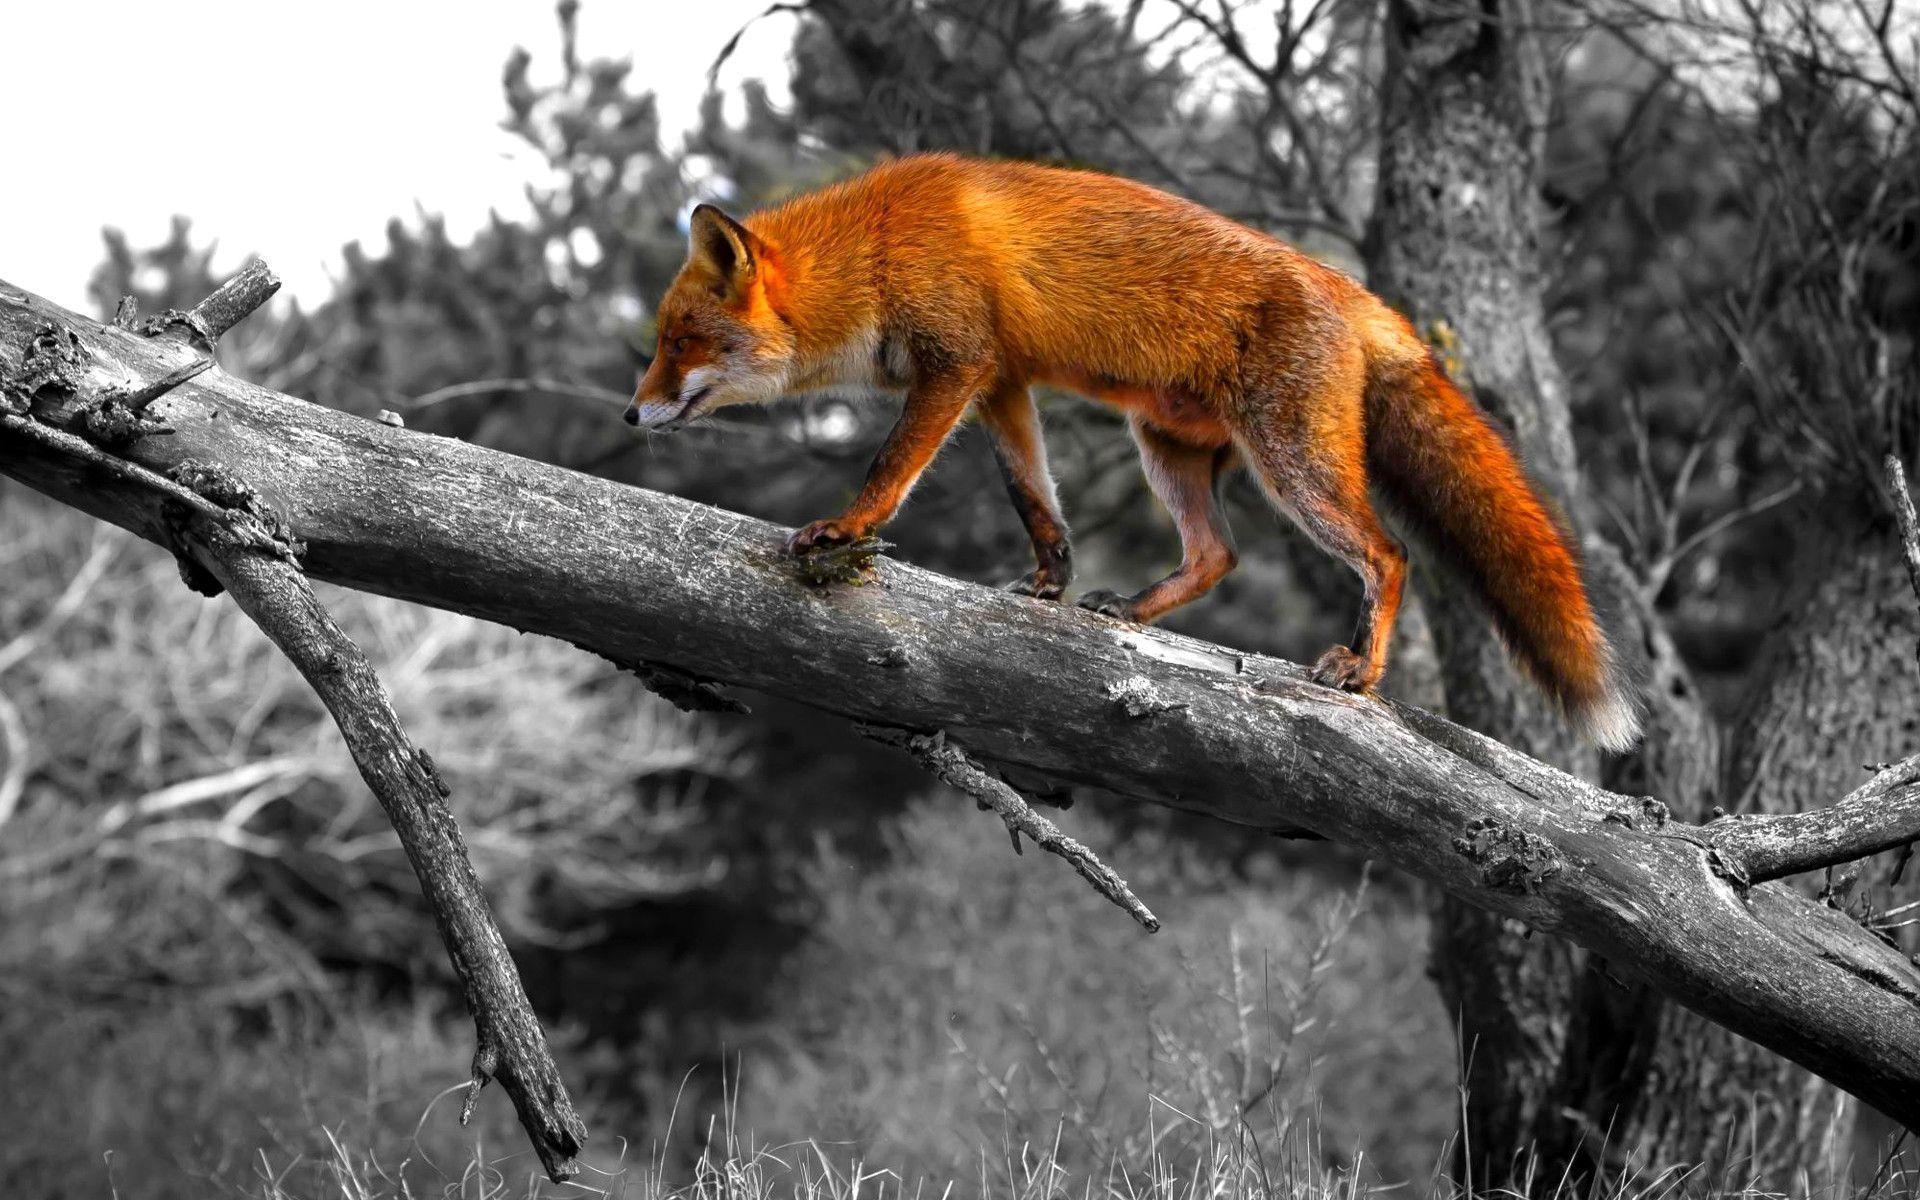 Red-fox-HD-Wallpaper-9 - Animals Planent.com